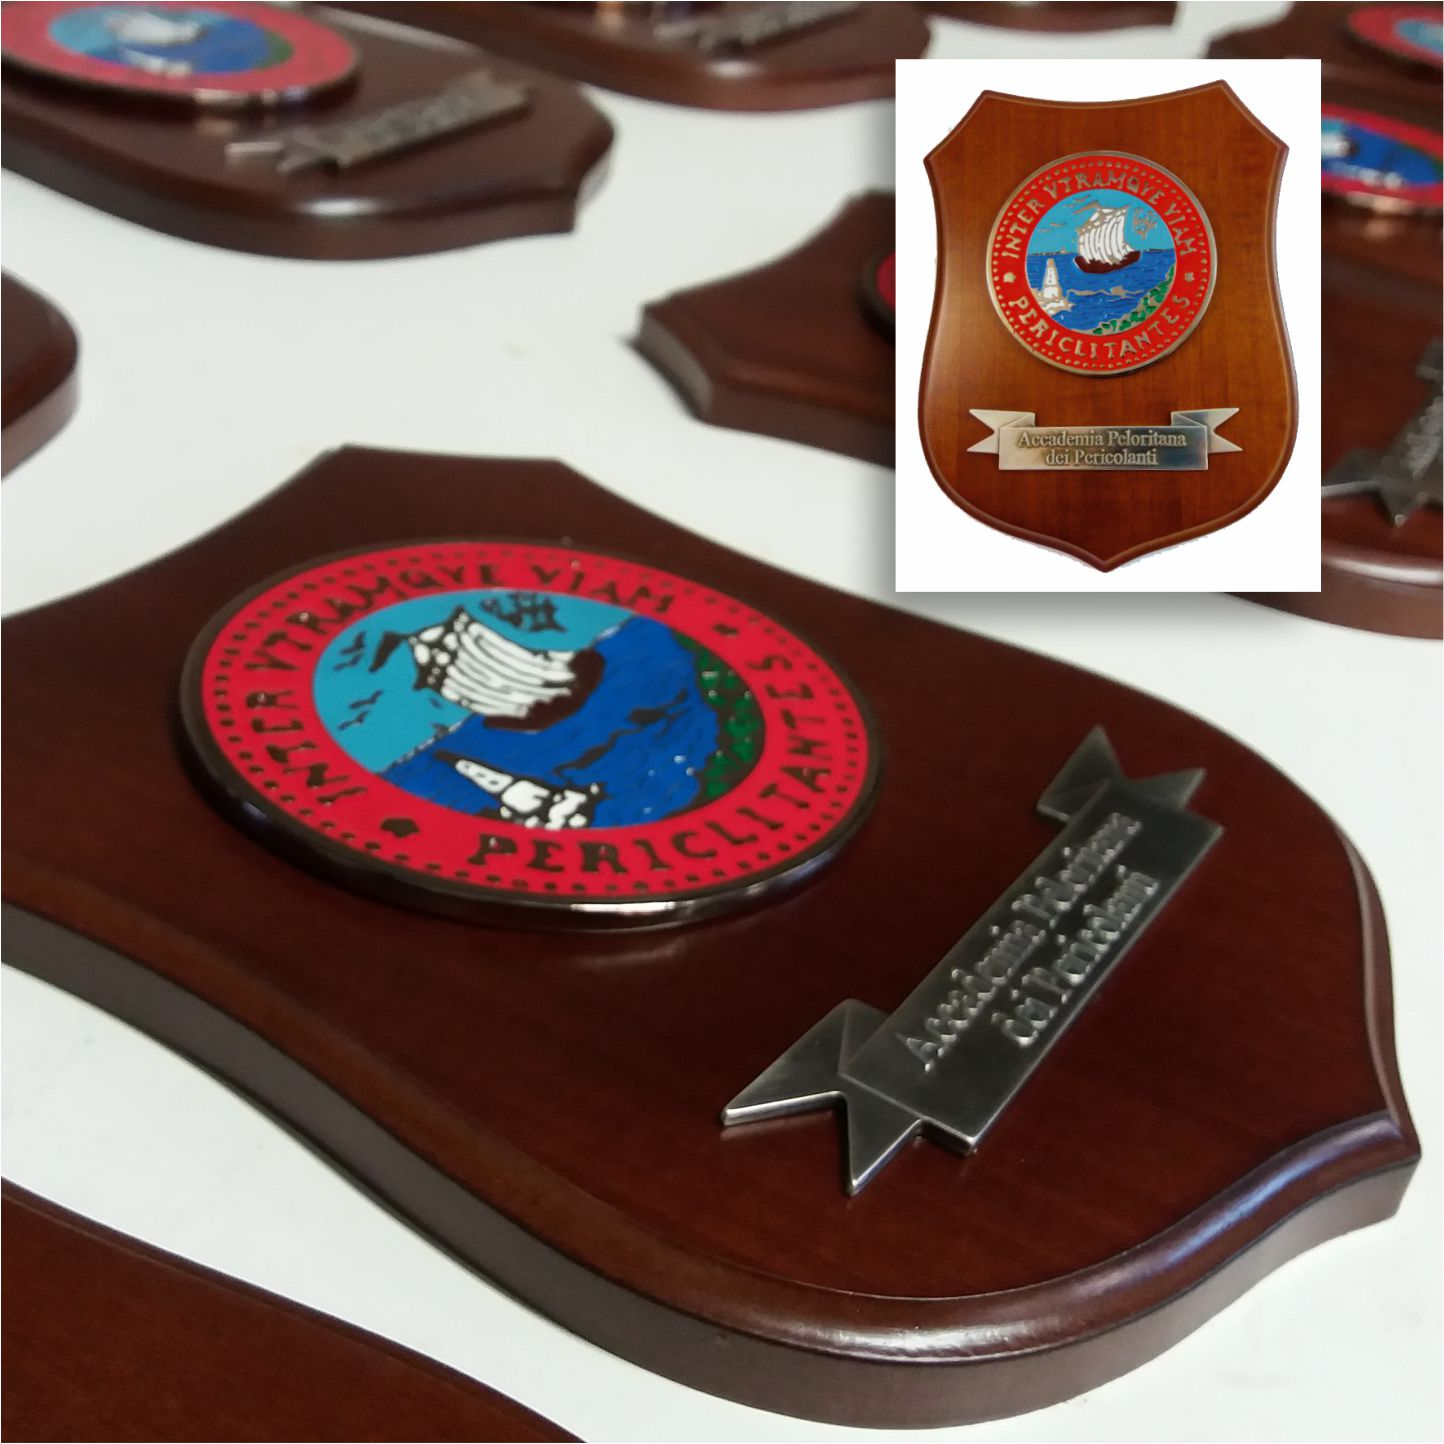 Crest Accademia Peloritana dei Pericolanti